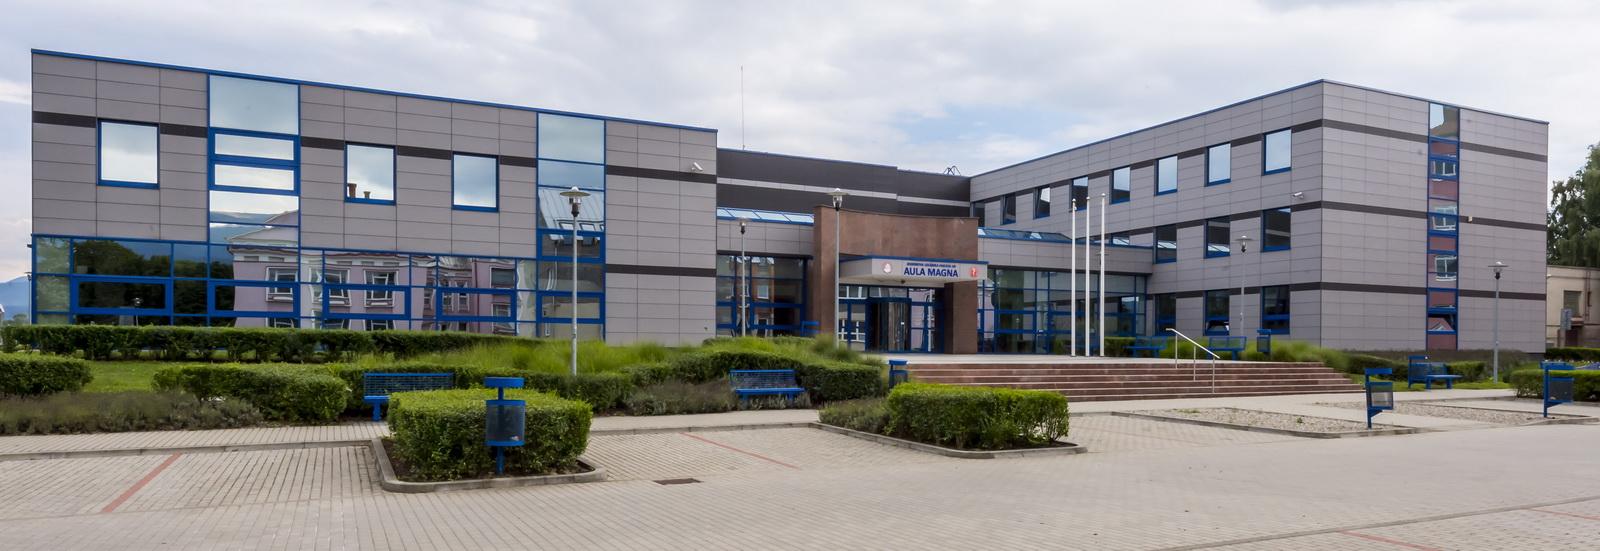 2- Deans Office and Aula Magna.jpg